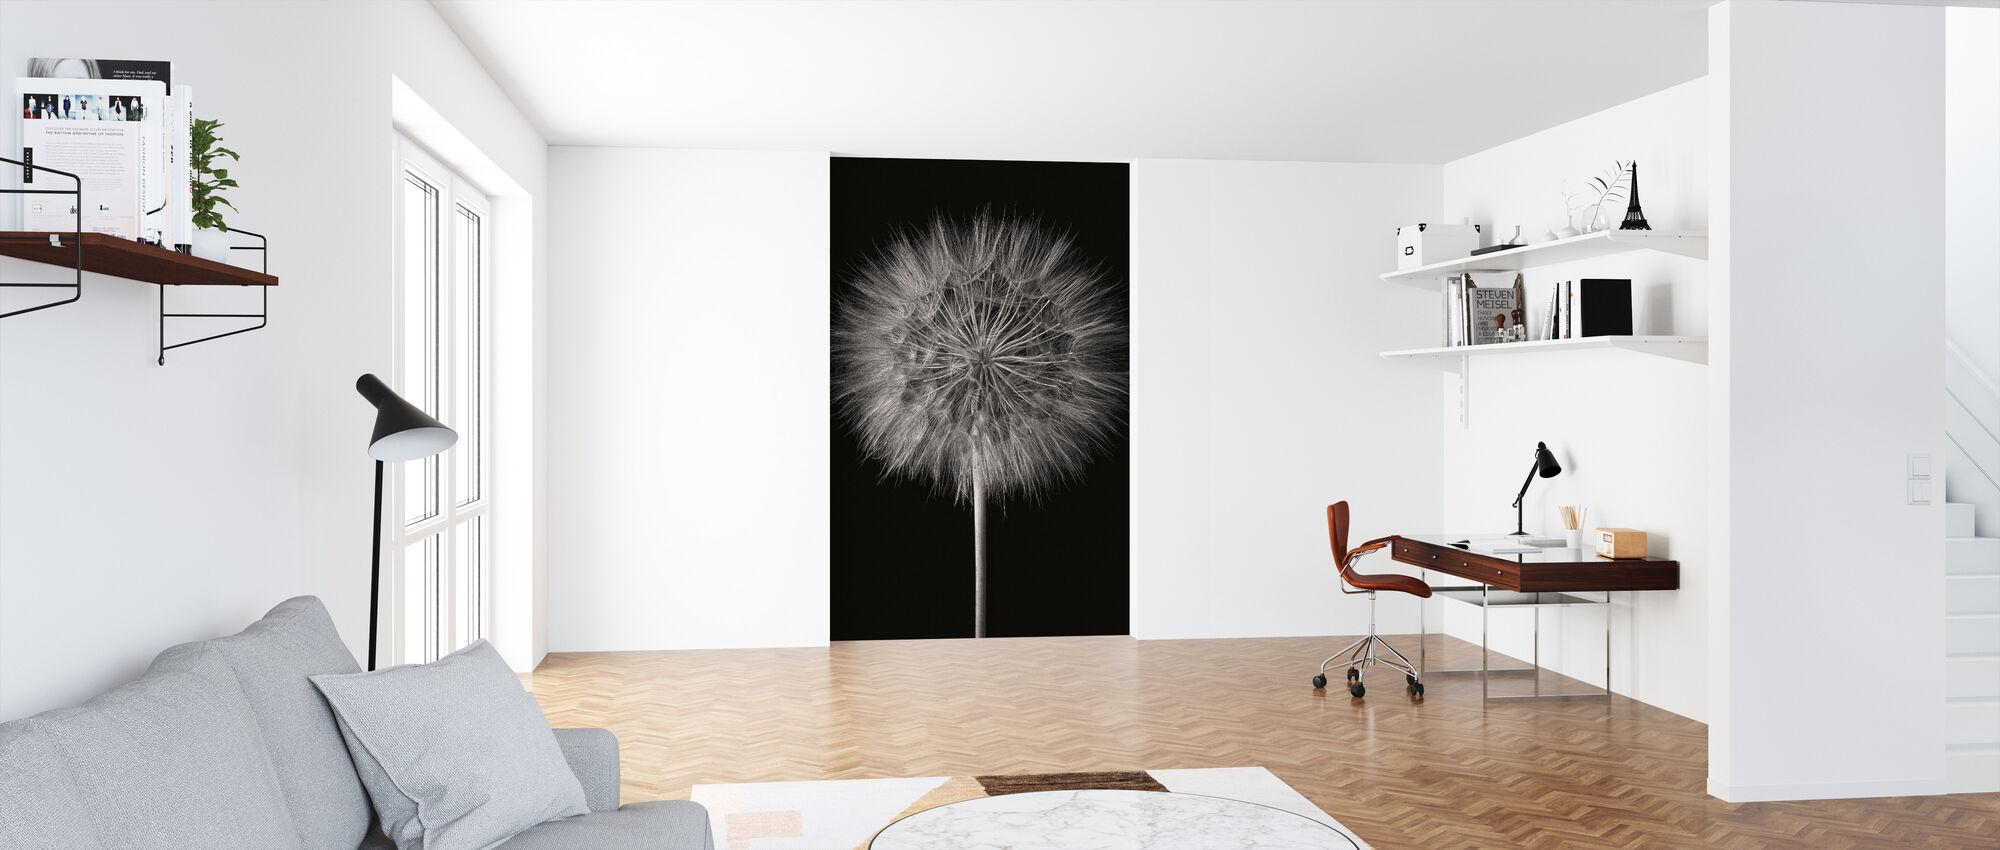 Dandelion Fluff on Black - Wallpaper - Office